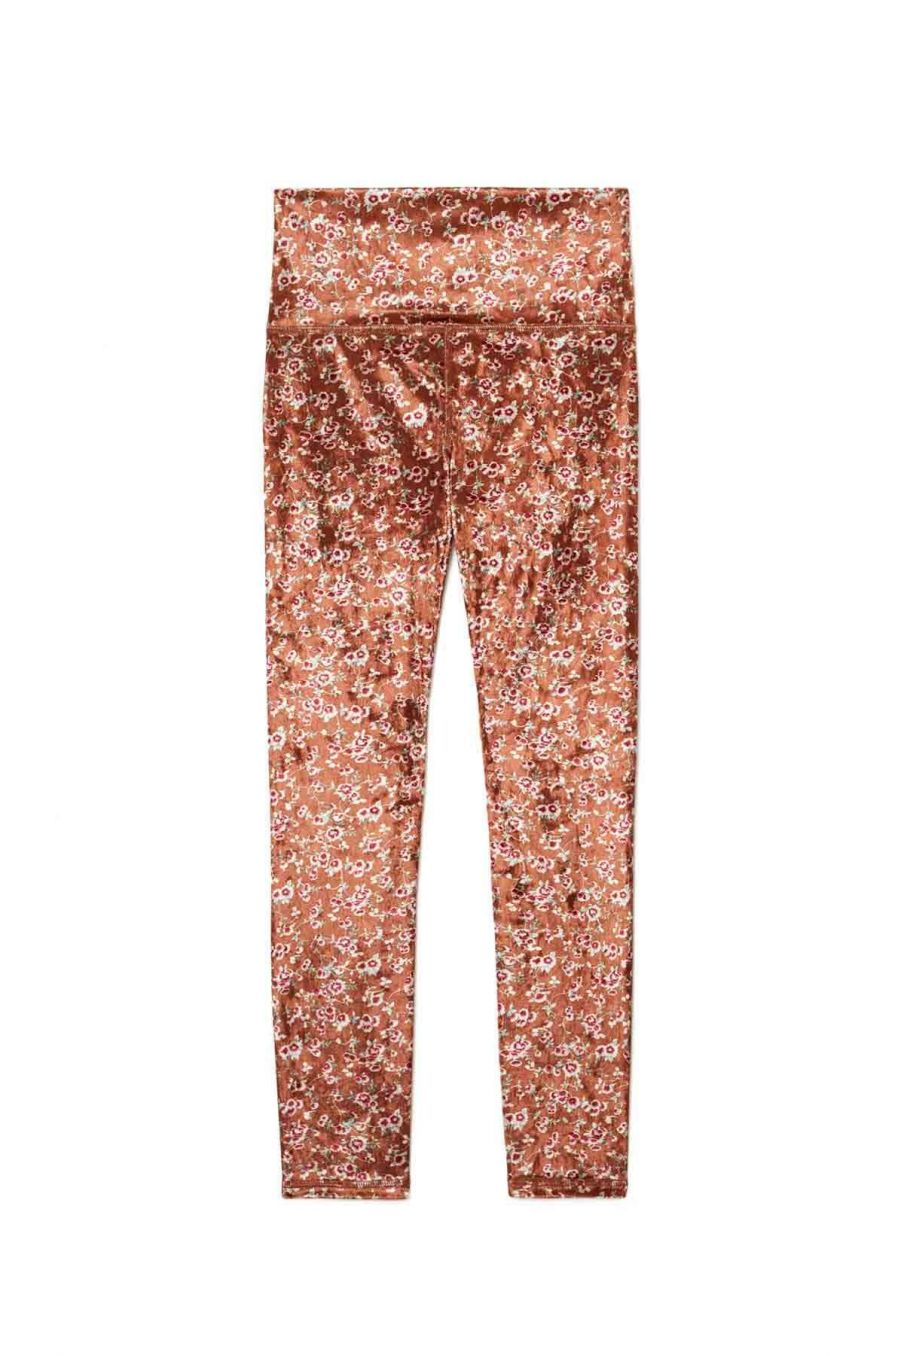 leggings femme navasana cinnamon gipsy flowers - louise misha